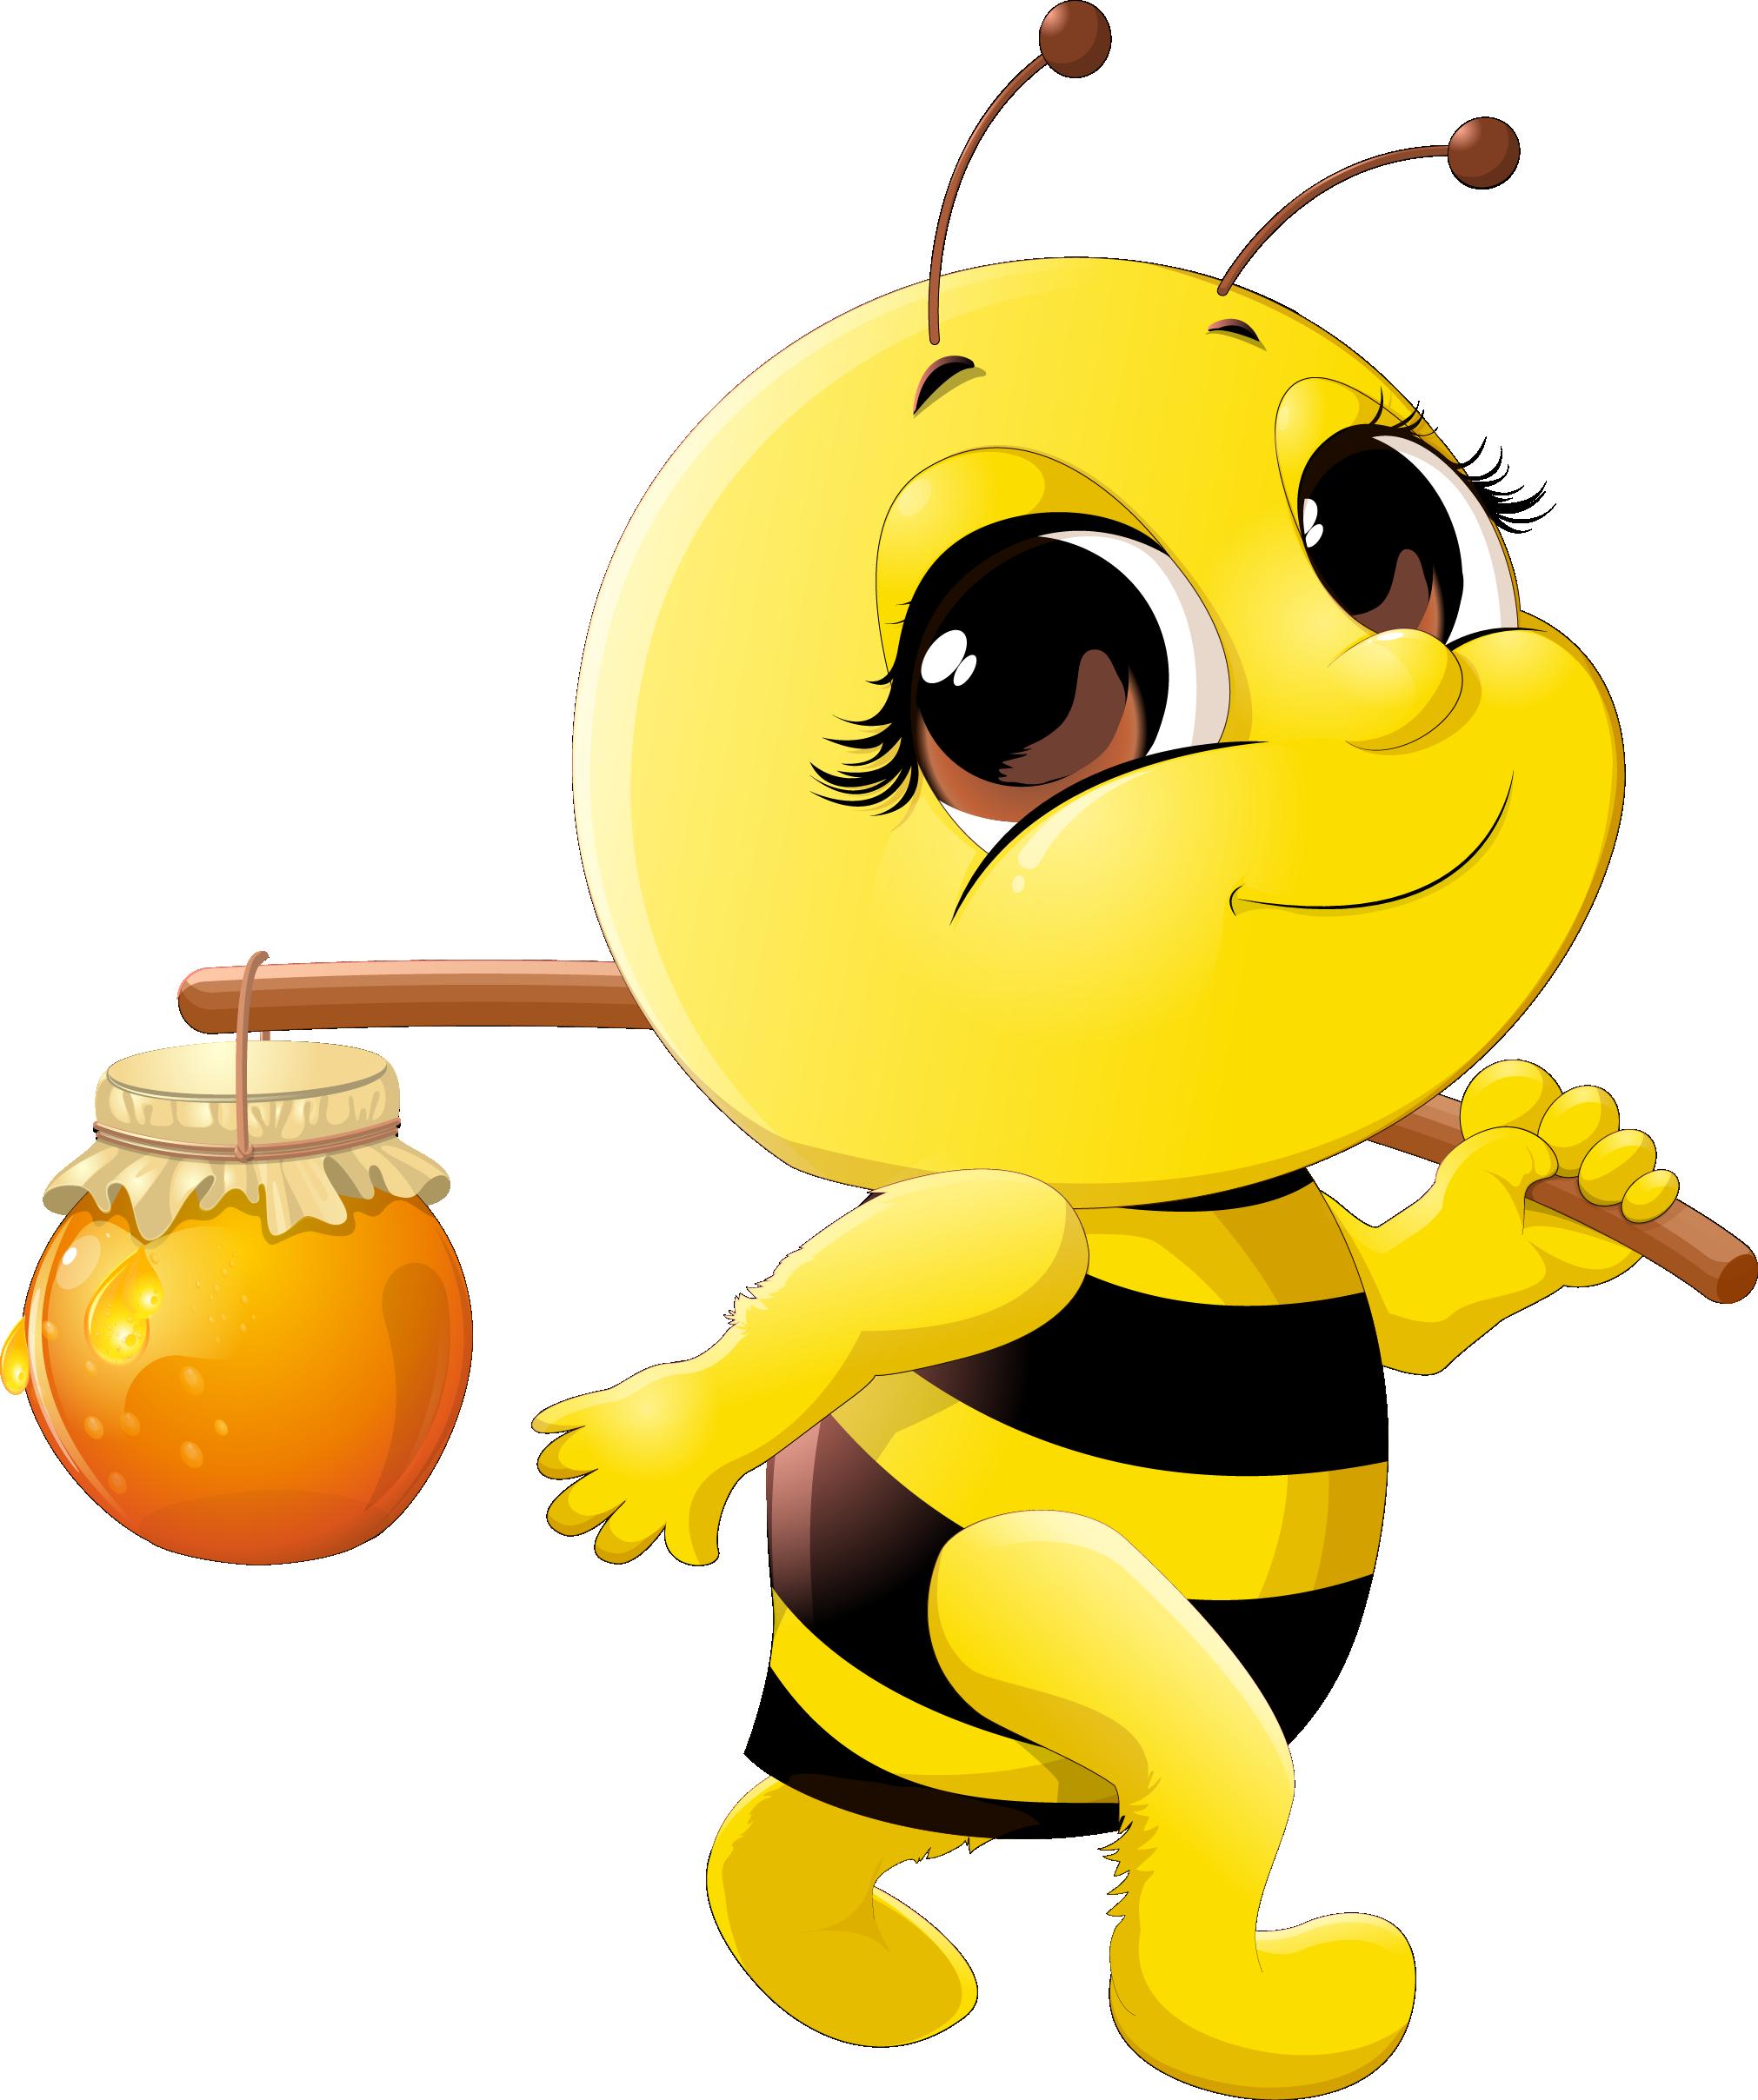 Honey clipart animal home. Bee cartoon clip art